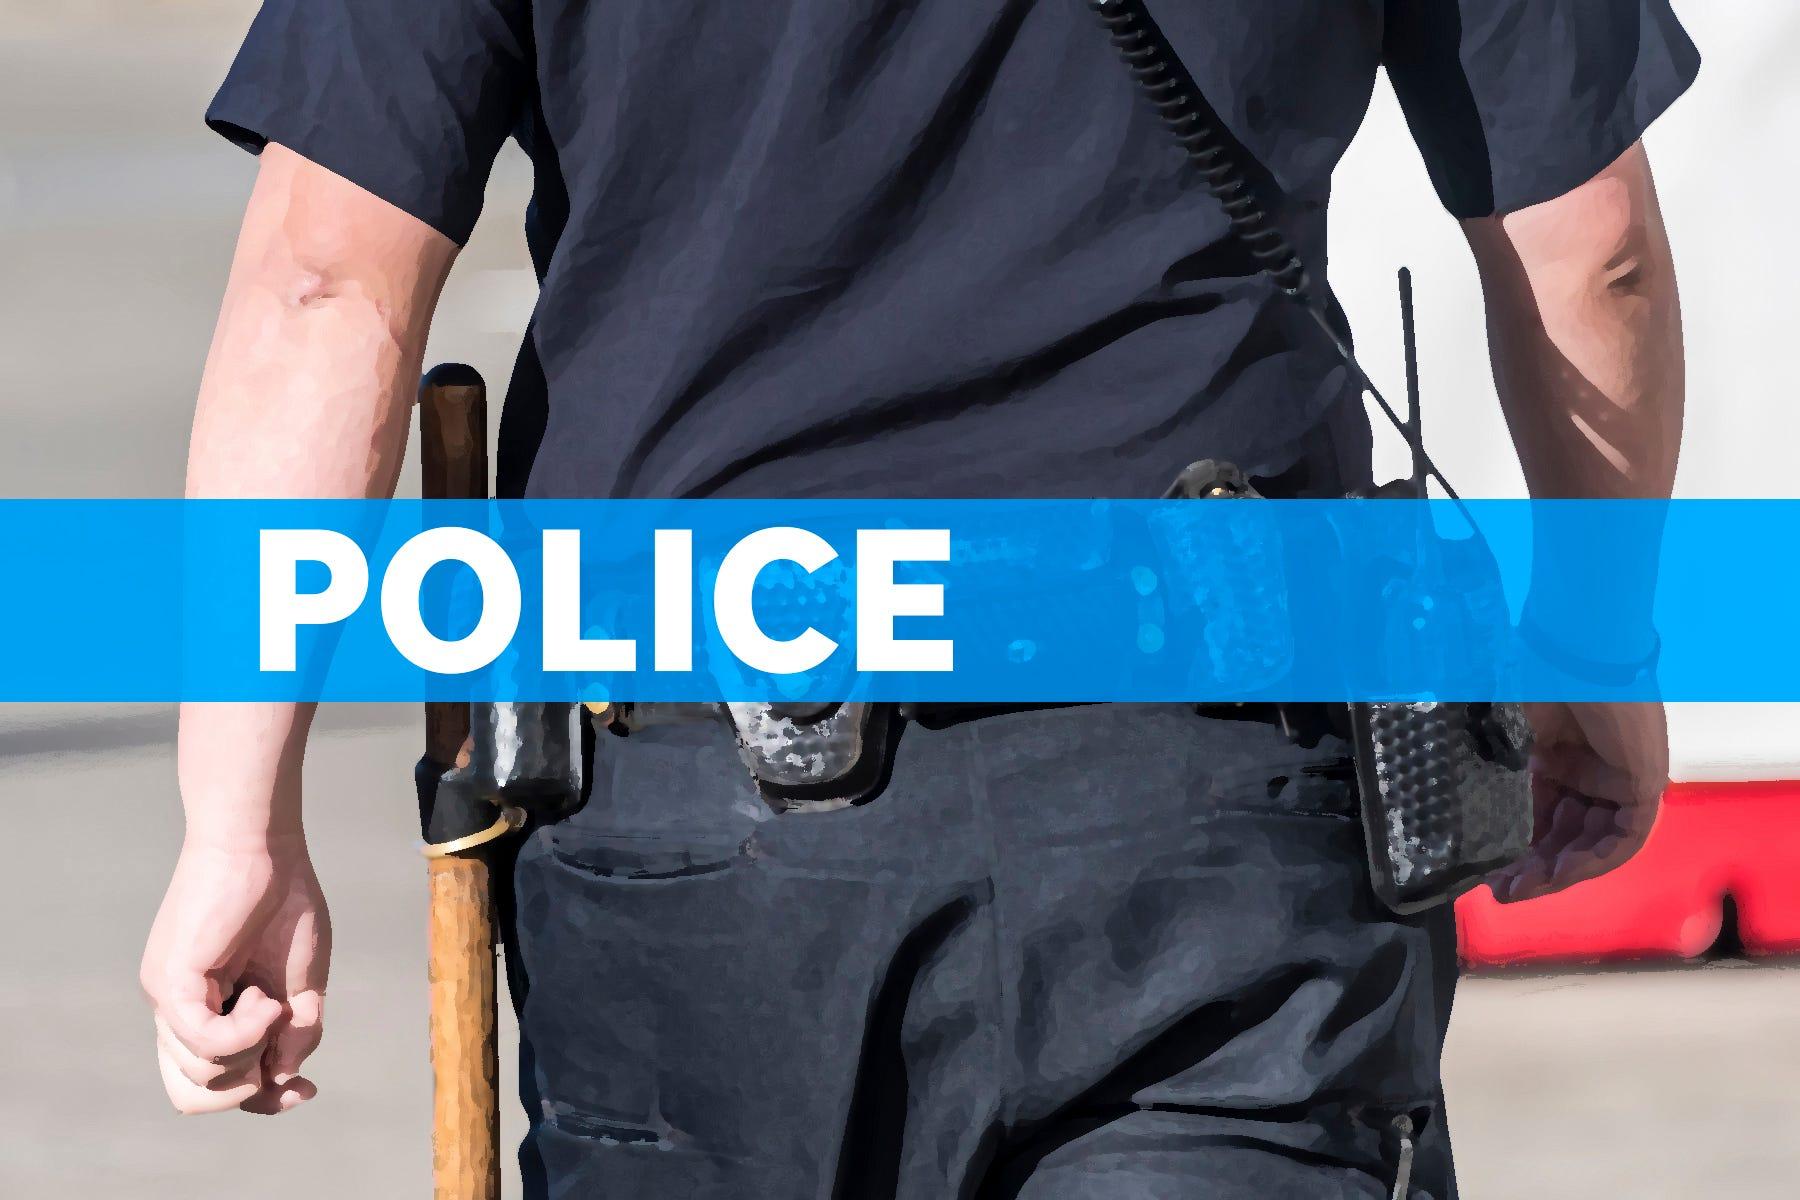 d0a5cb82-bafd-4797-b43a-c334c584e5a8-POLICE_STOCK_IMAGE_STOCK-2